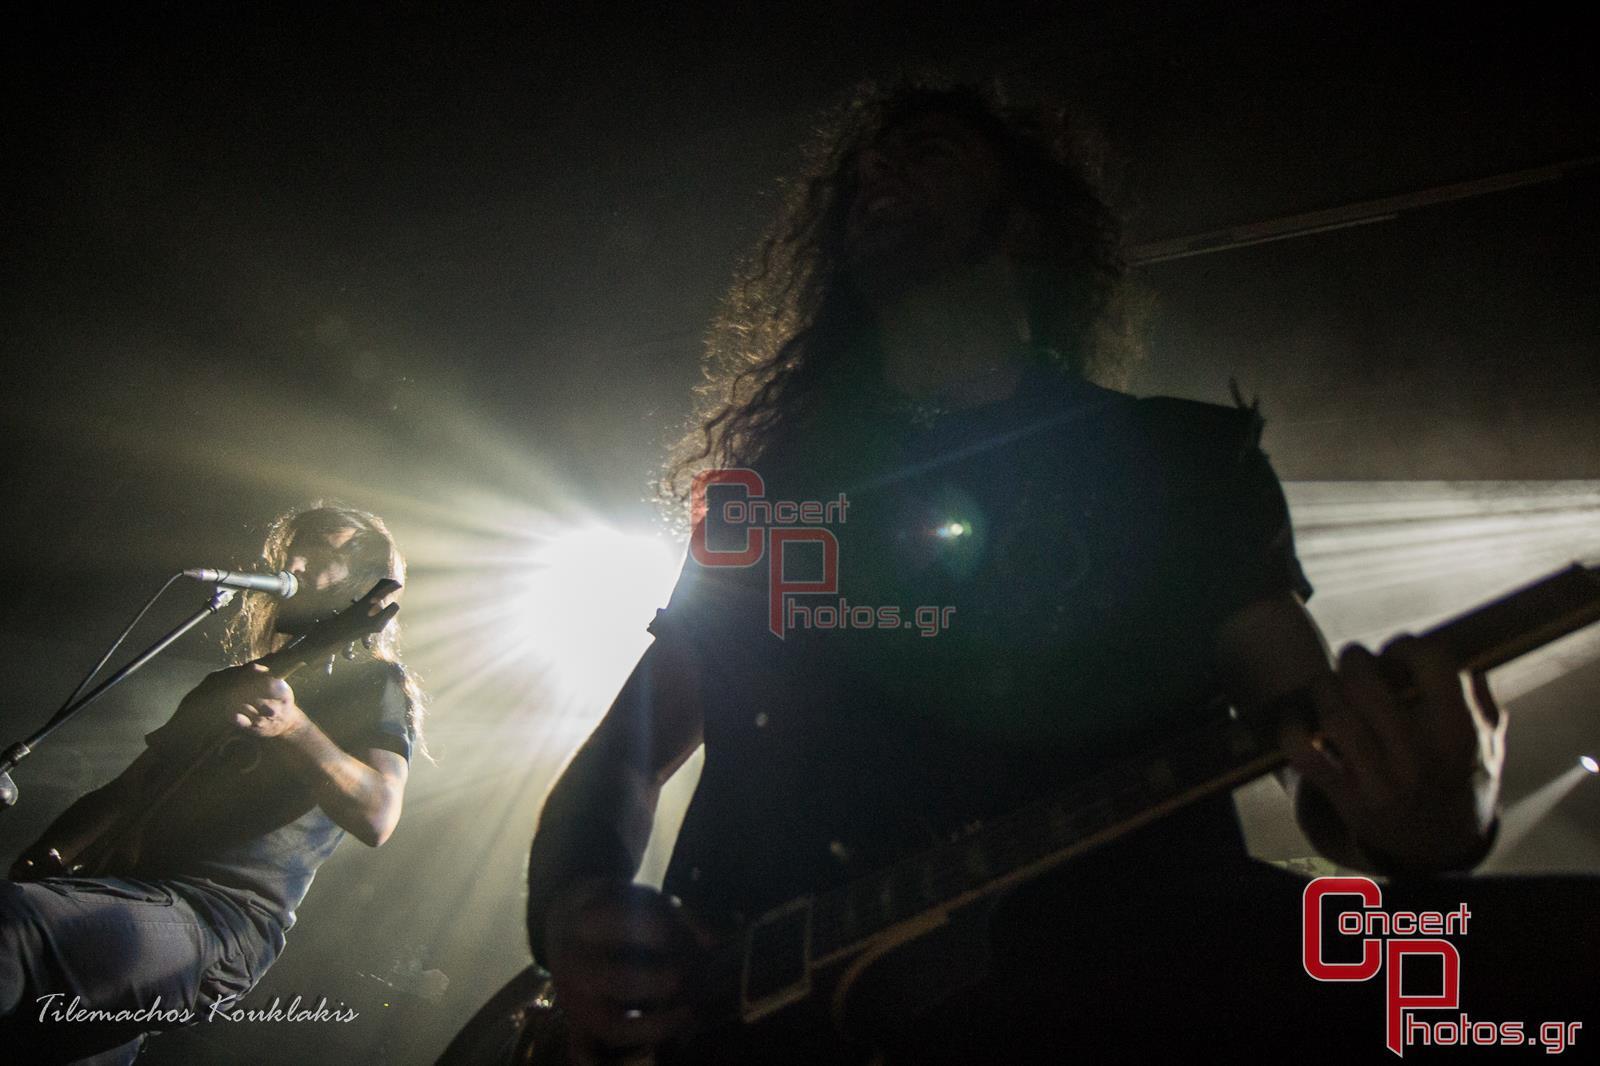 Rotting Christ-Rotting Christ photographer:  - ConcertPhotos-5225